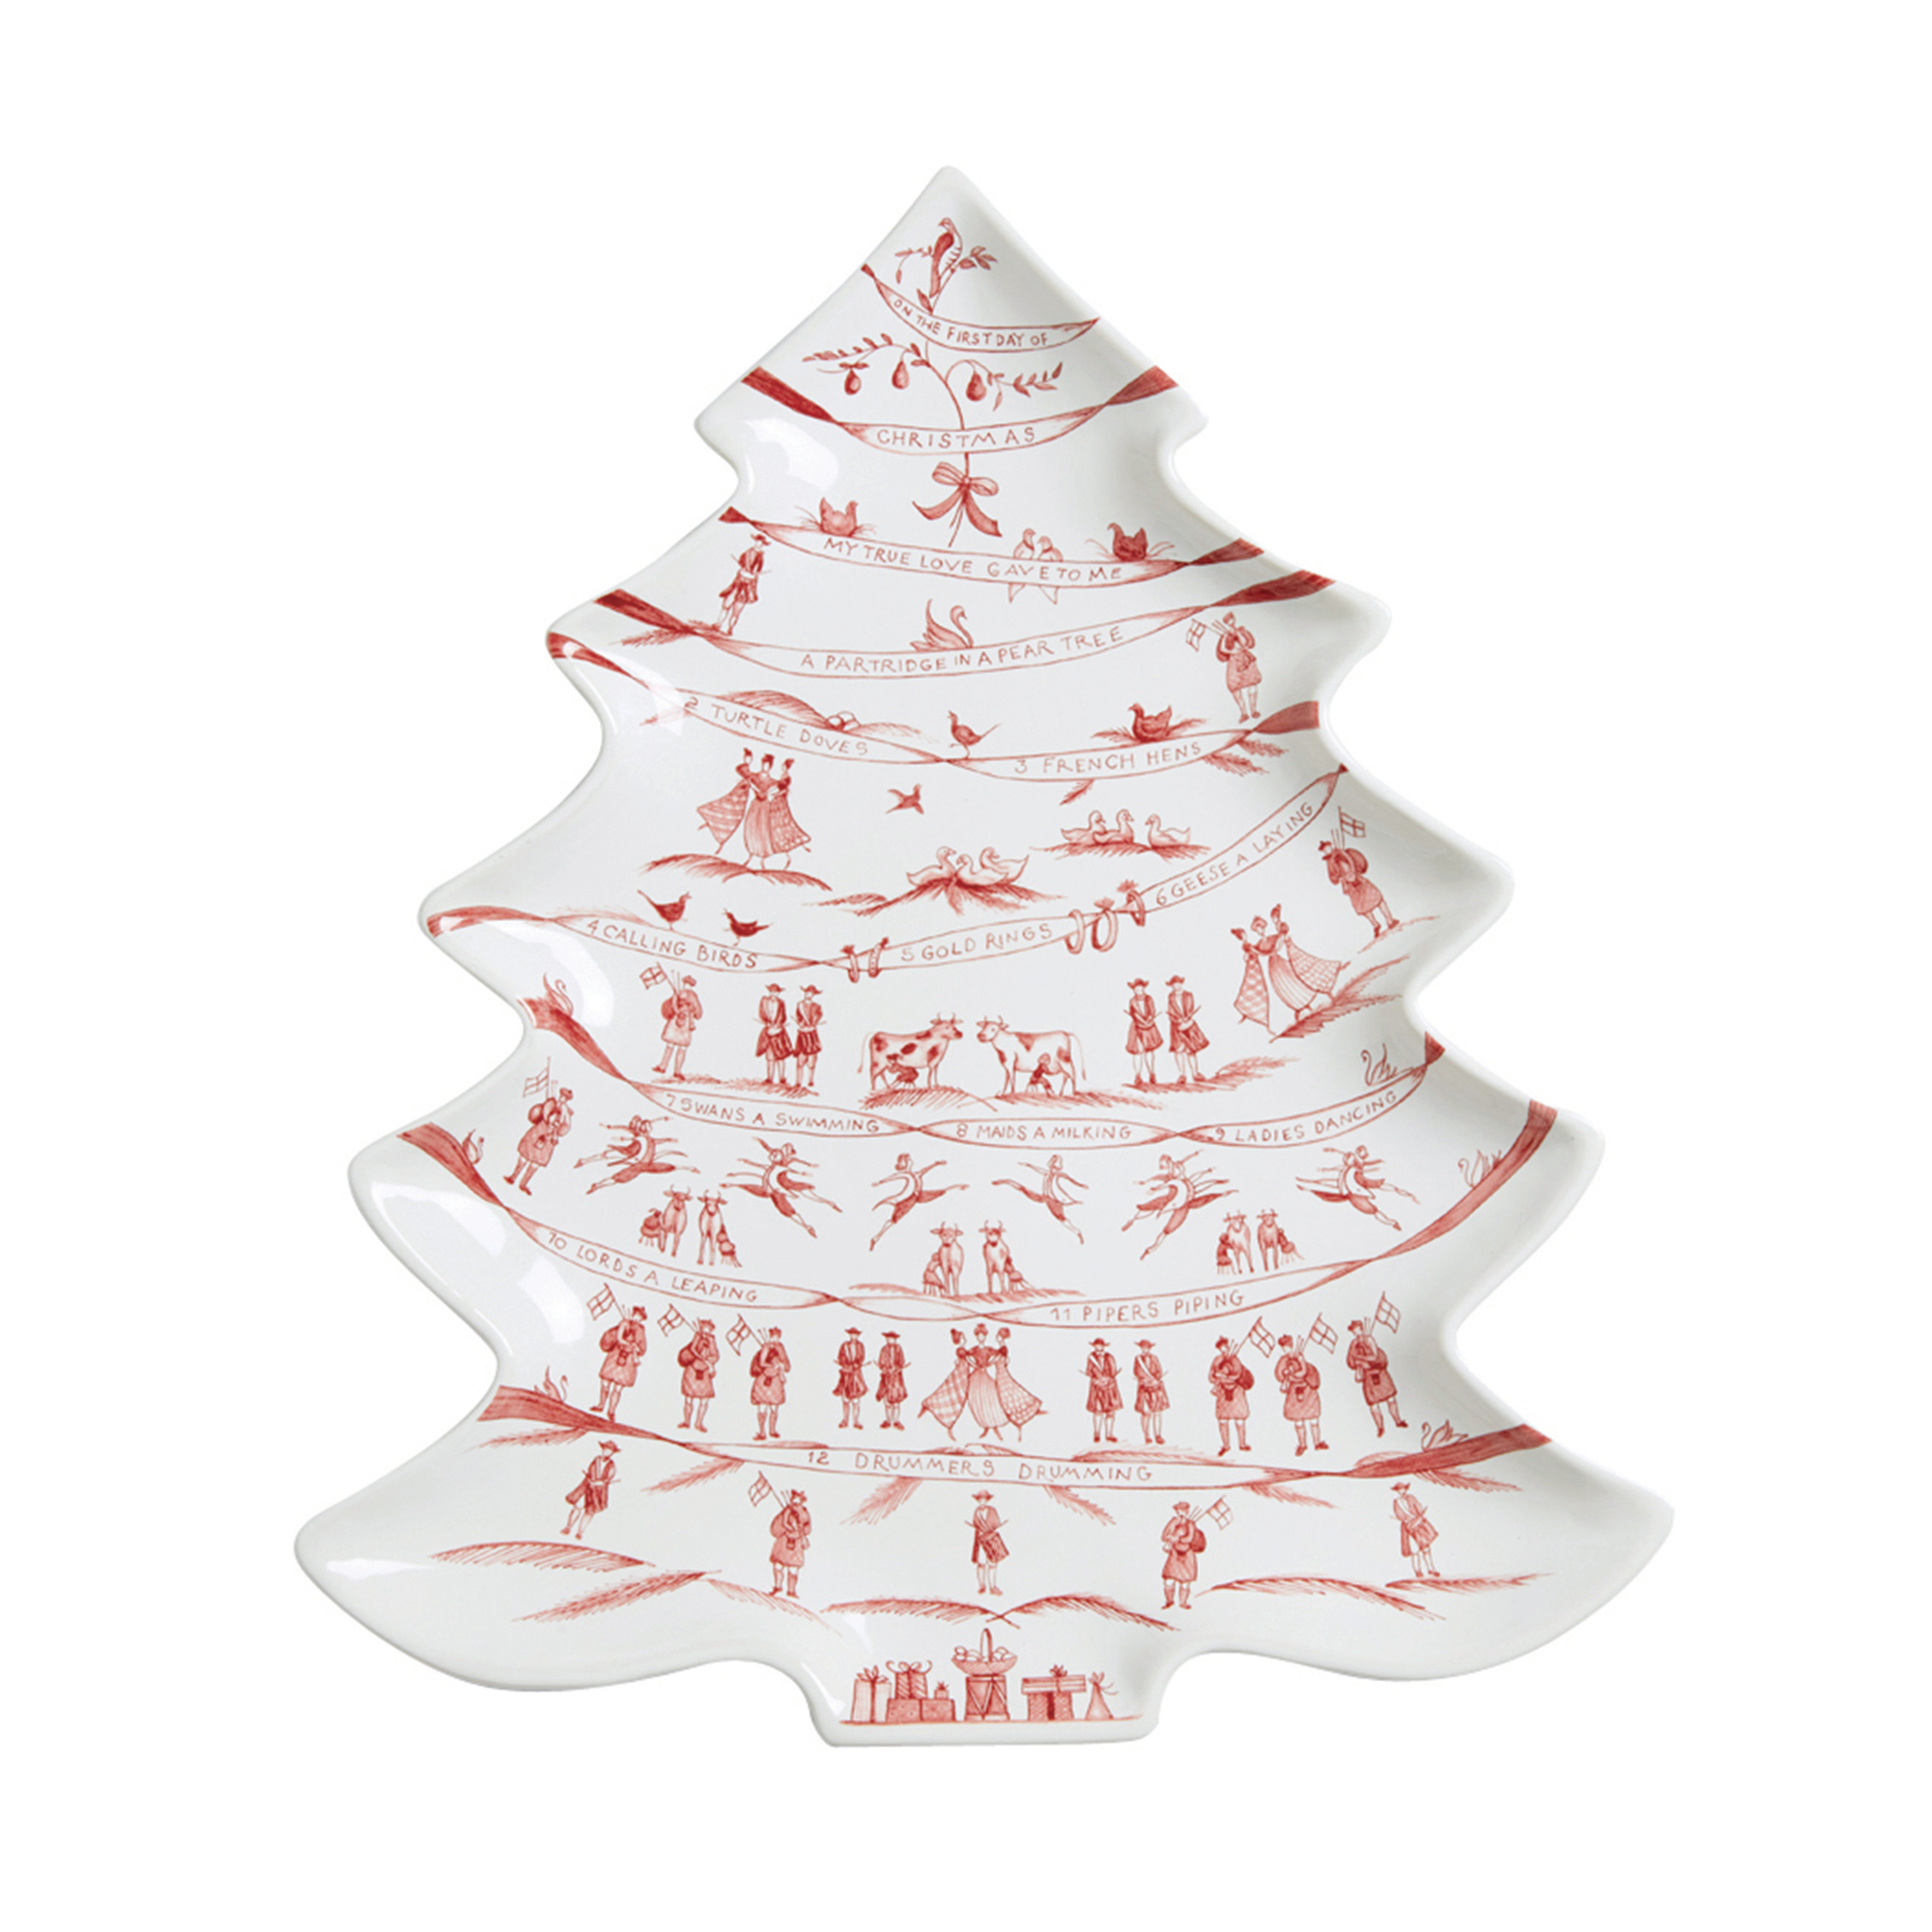 Juliska Country Estate \'Twelve Days of Christmas\' Platter, Ruby | Gump\'s